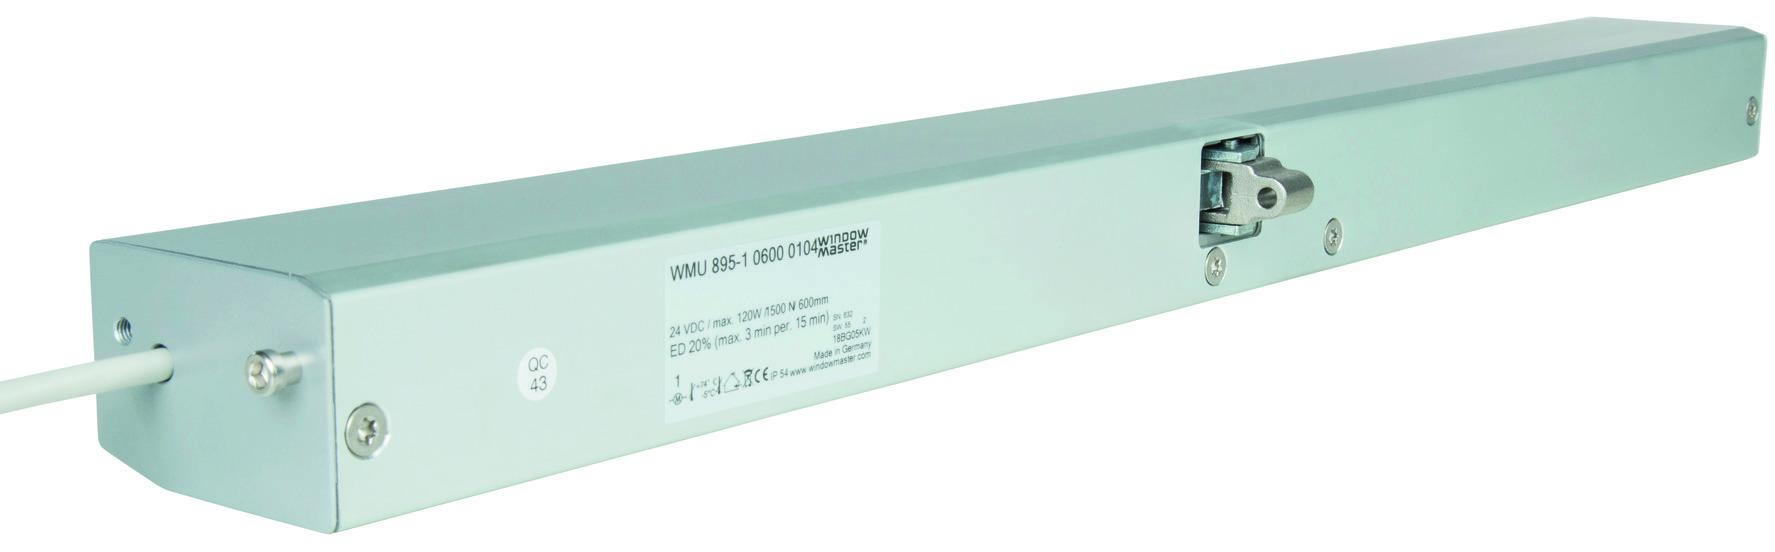 Kettenantrieb WINDOWMASTER WMU 895 SINGLE